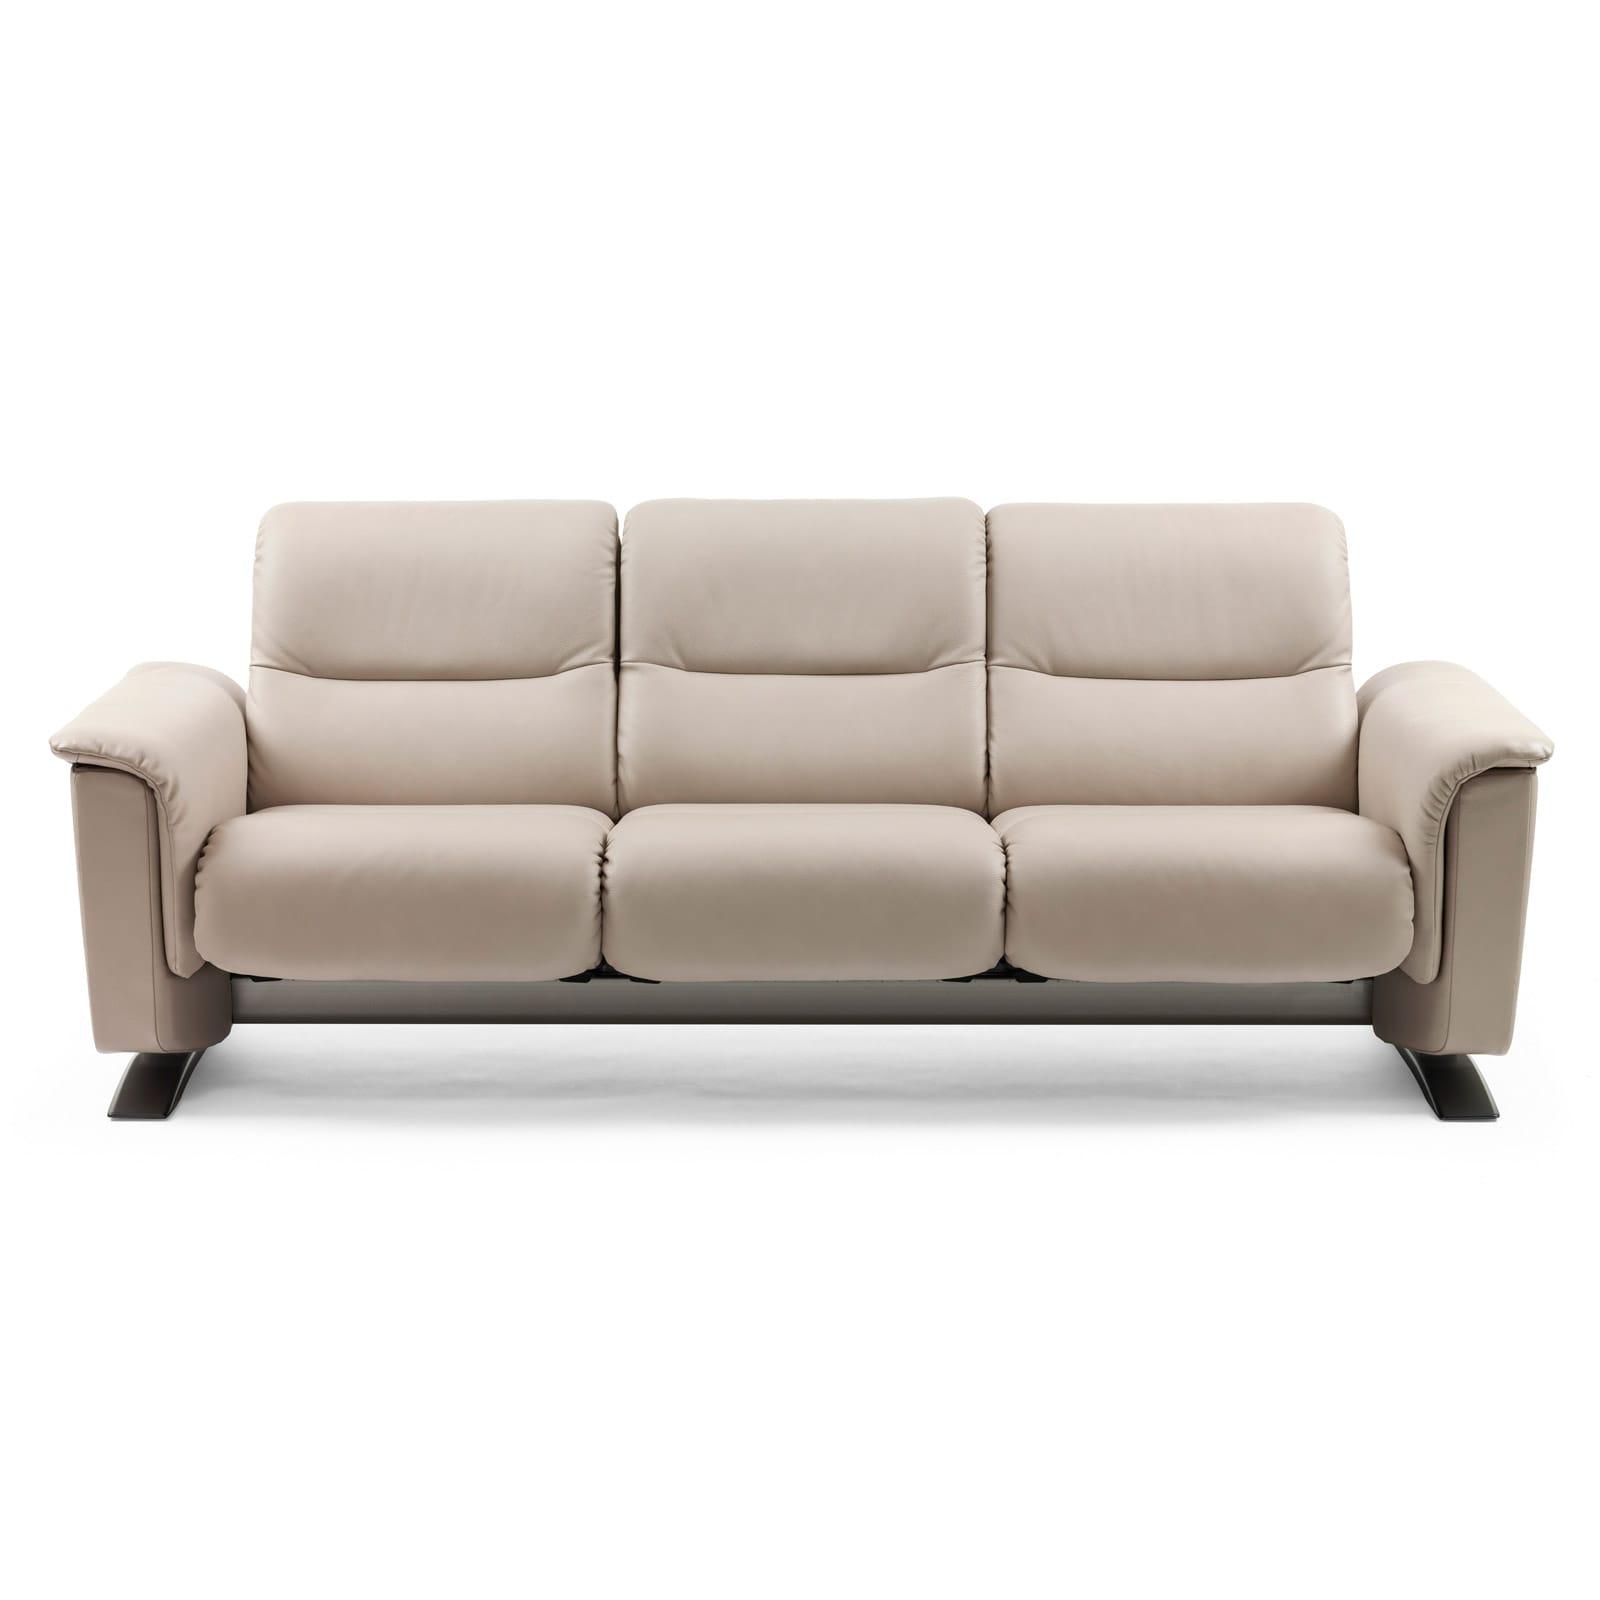 Stressless sofa 3 sitzer panorama beige stressless for Sofa 4 sitzer